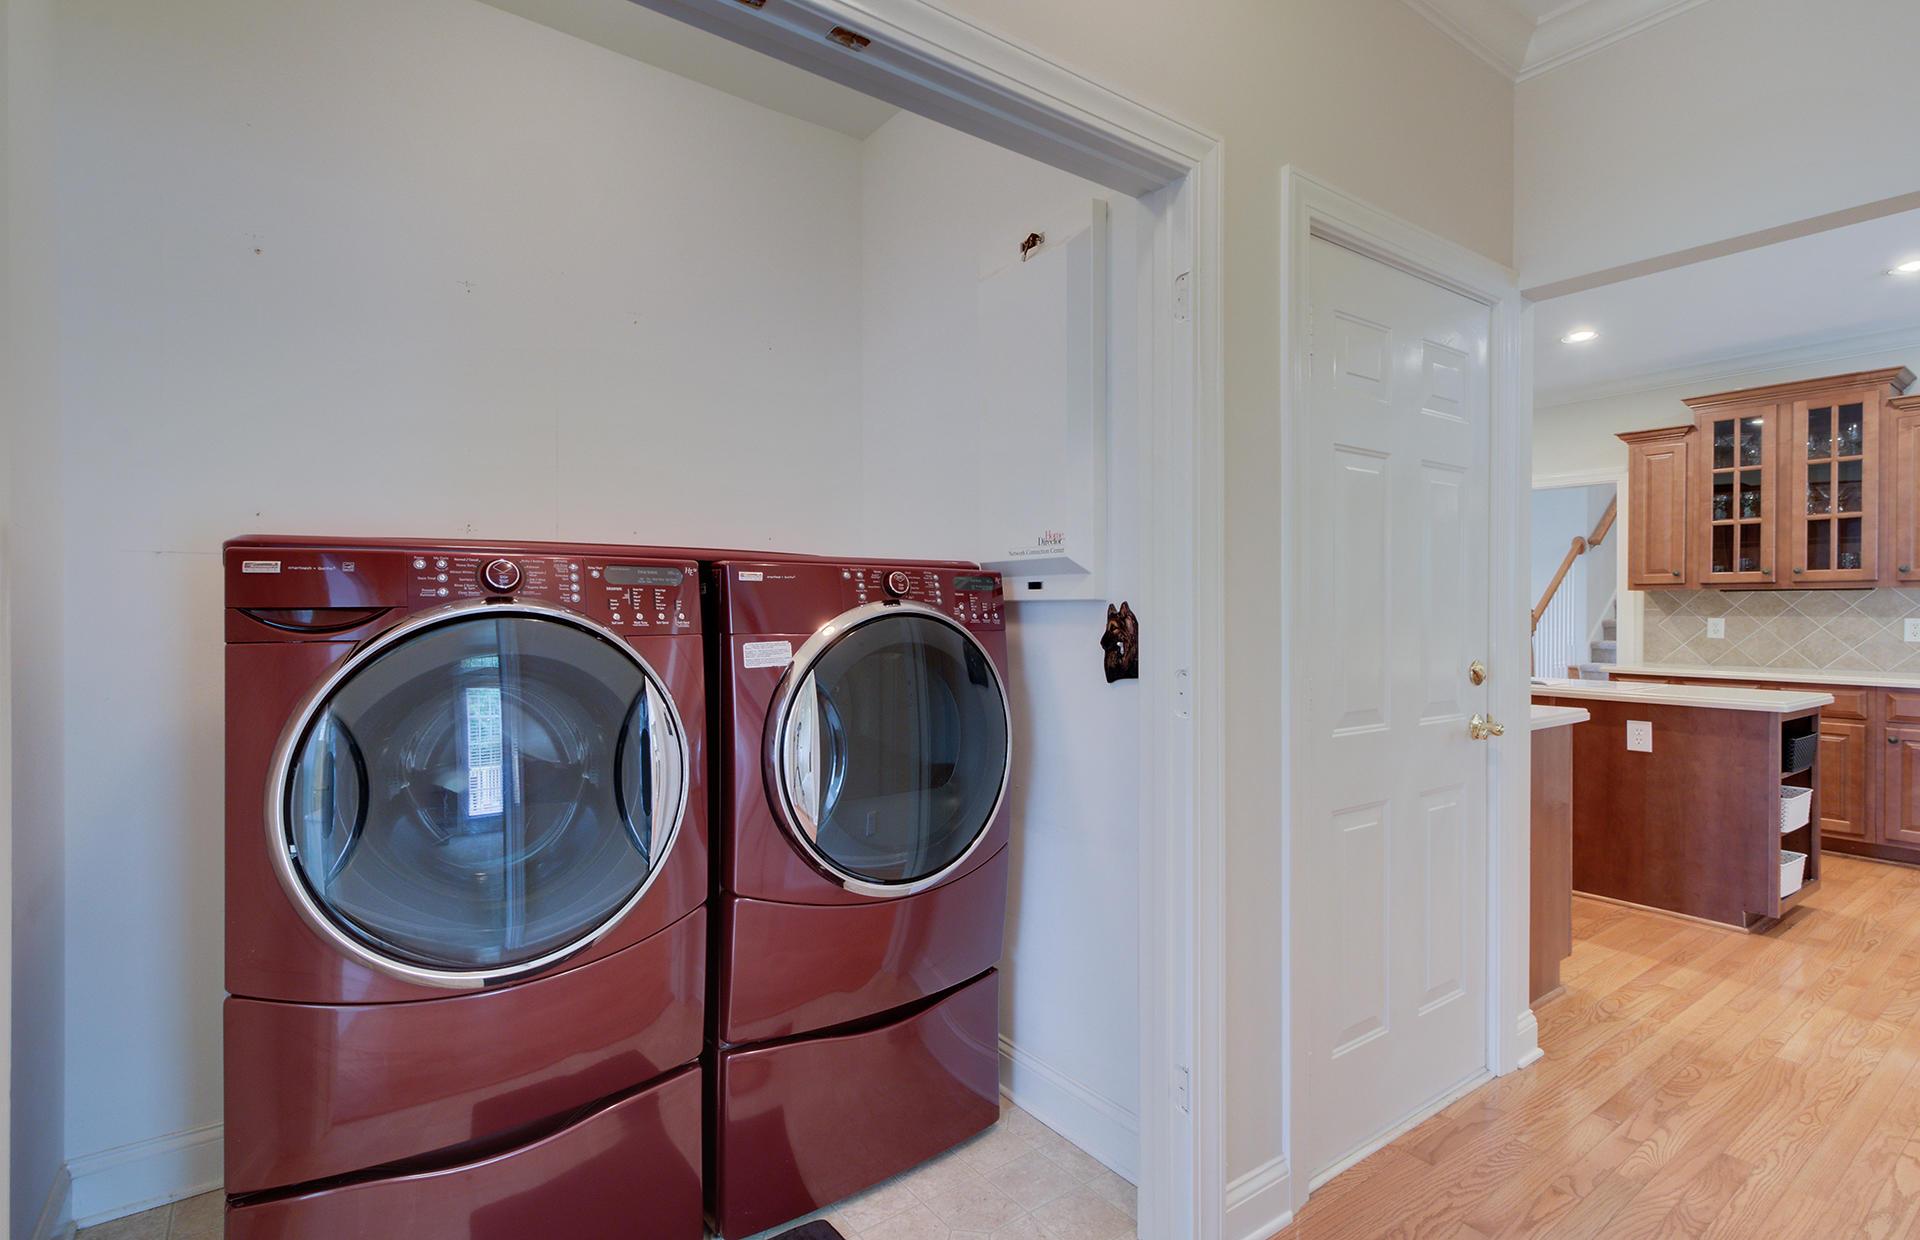 Dunes West Homes For Sale - 2453 Darts Cove, Mount Pleasant, SC - 9